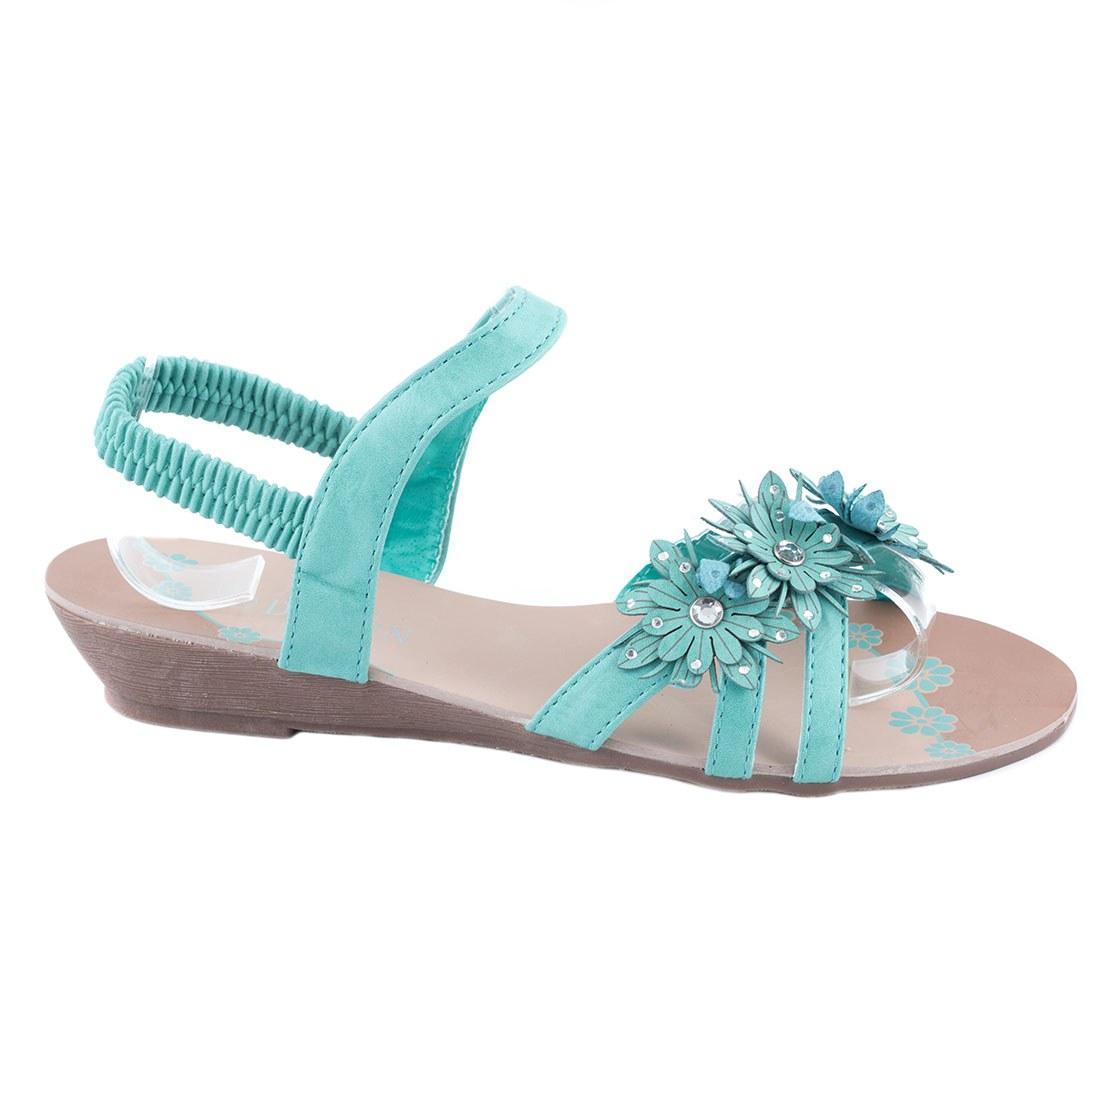 Sandale dama cu talpa joasa TP-02-LT-BLUE la 29,99Lei